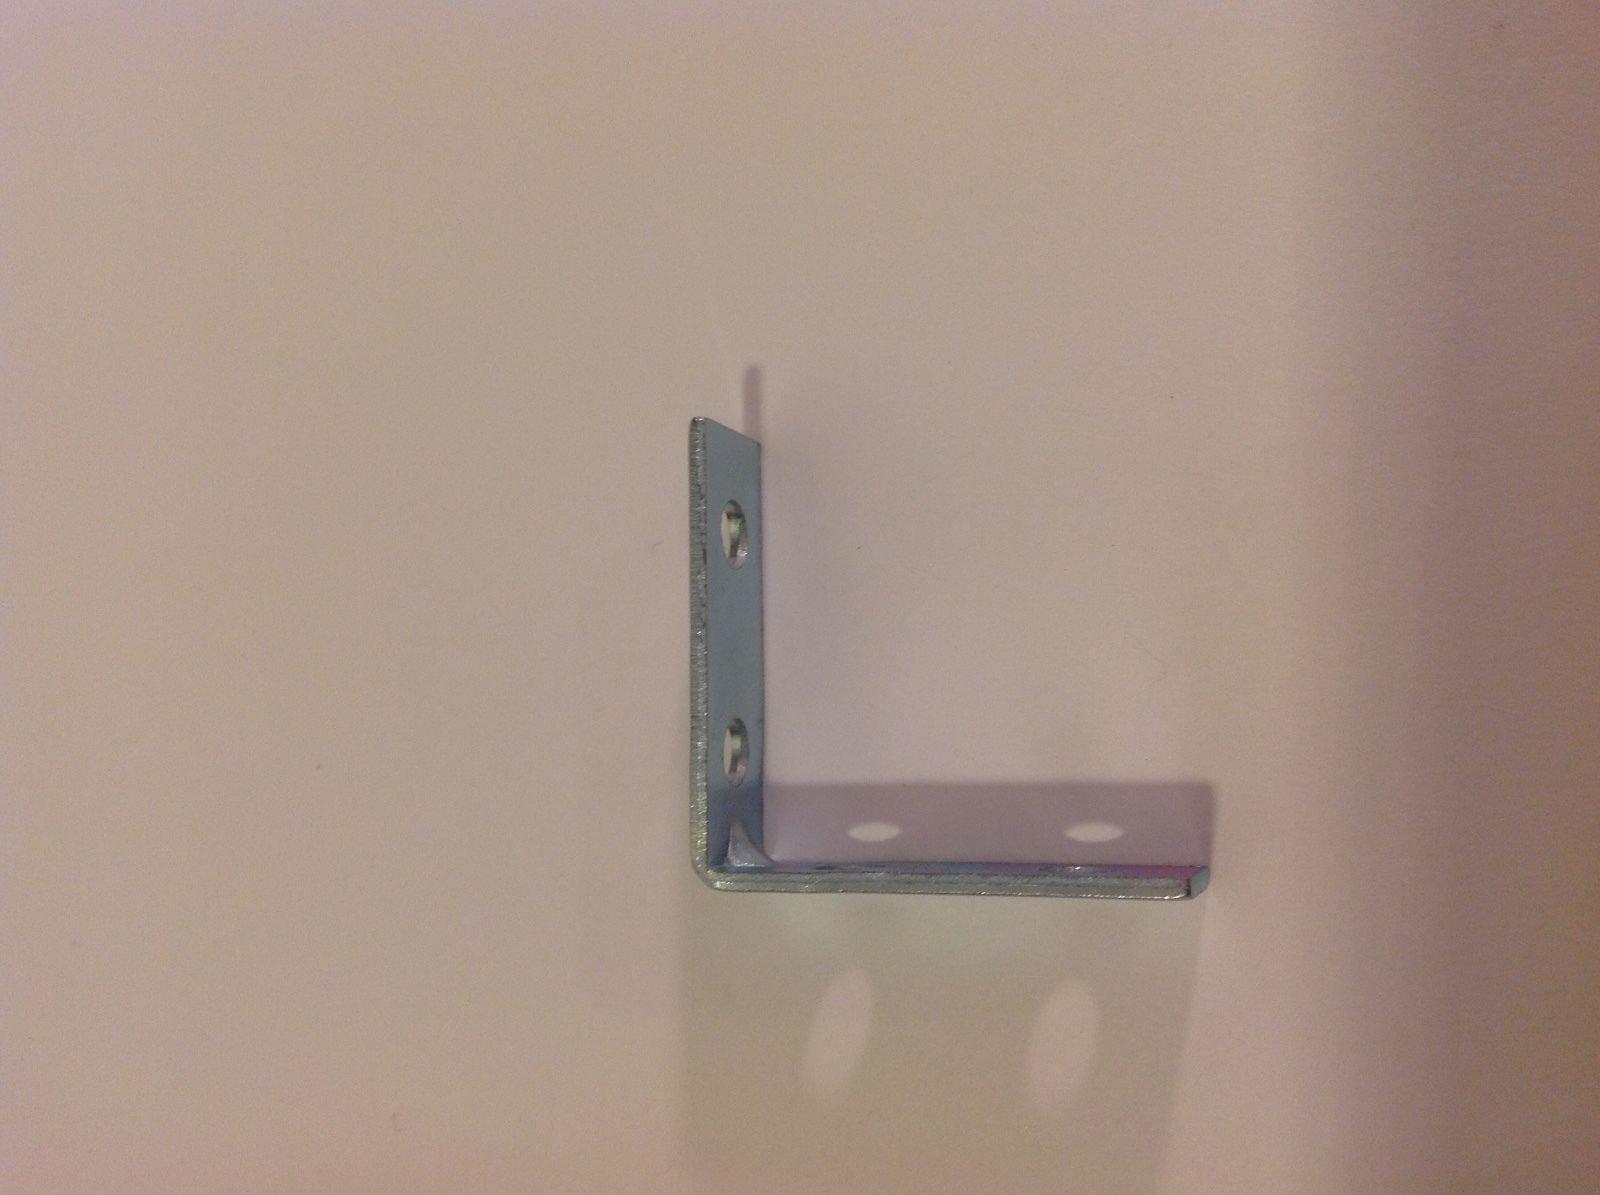 ALF_CAD 1.5 x 1.5 L Bracket Angle Iron Corner Brace Joint Metal Install Shelf Cabinet